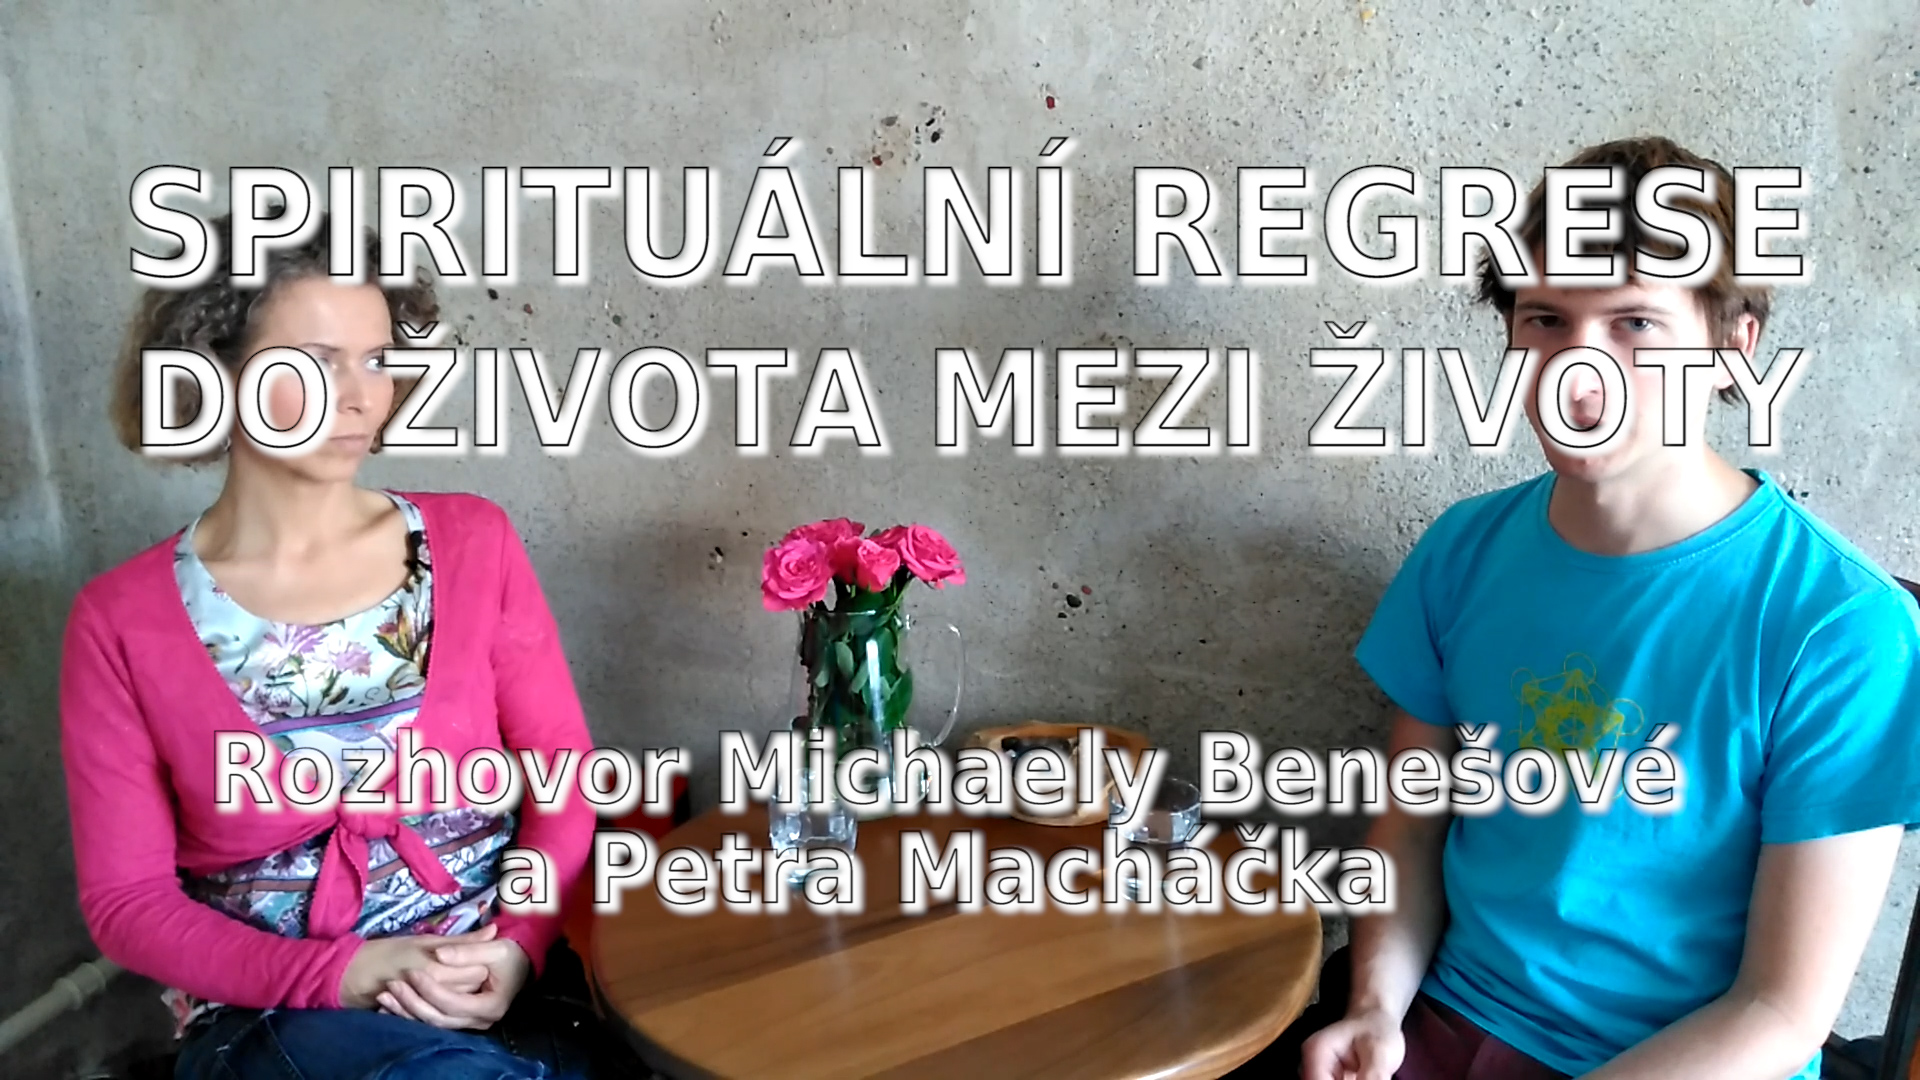 Rozhovor s Michaelou Benešovou o Spirituální regresi do života mezi životy